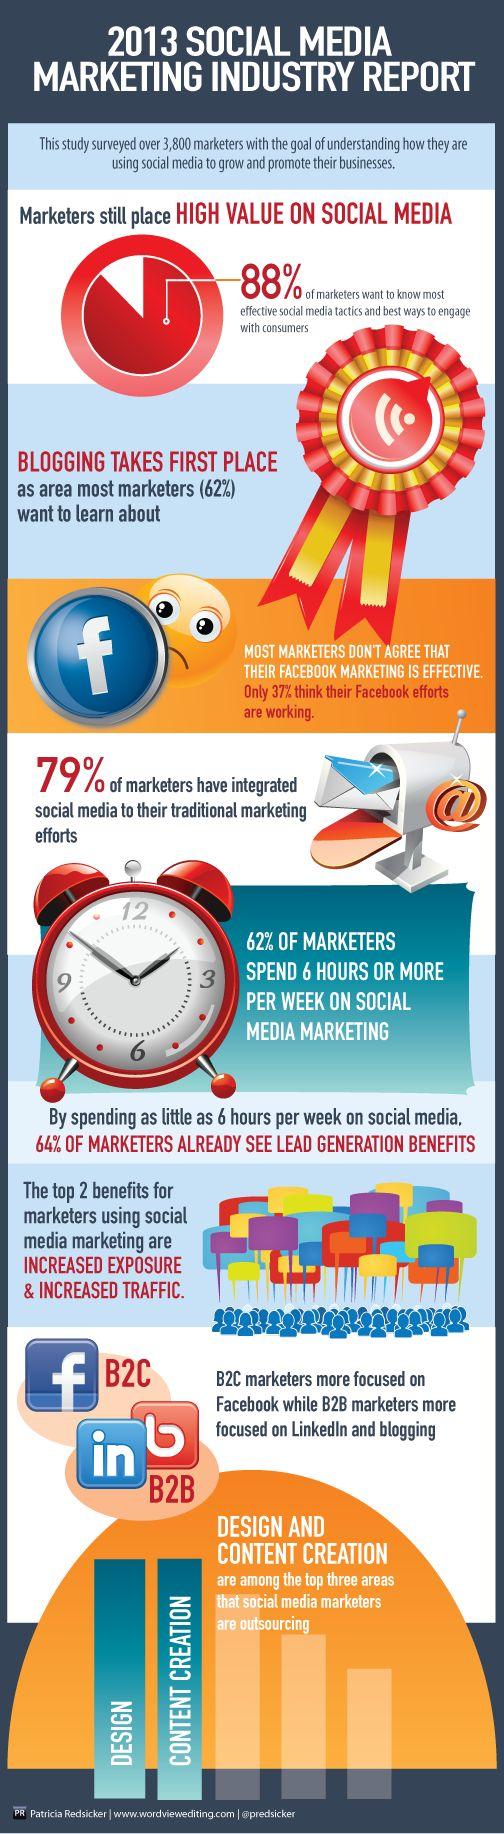 Best Social Media Resources Images On   Social Media